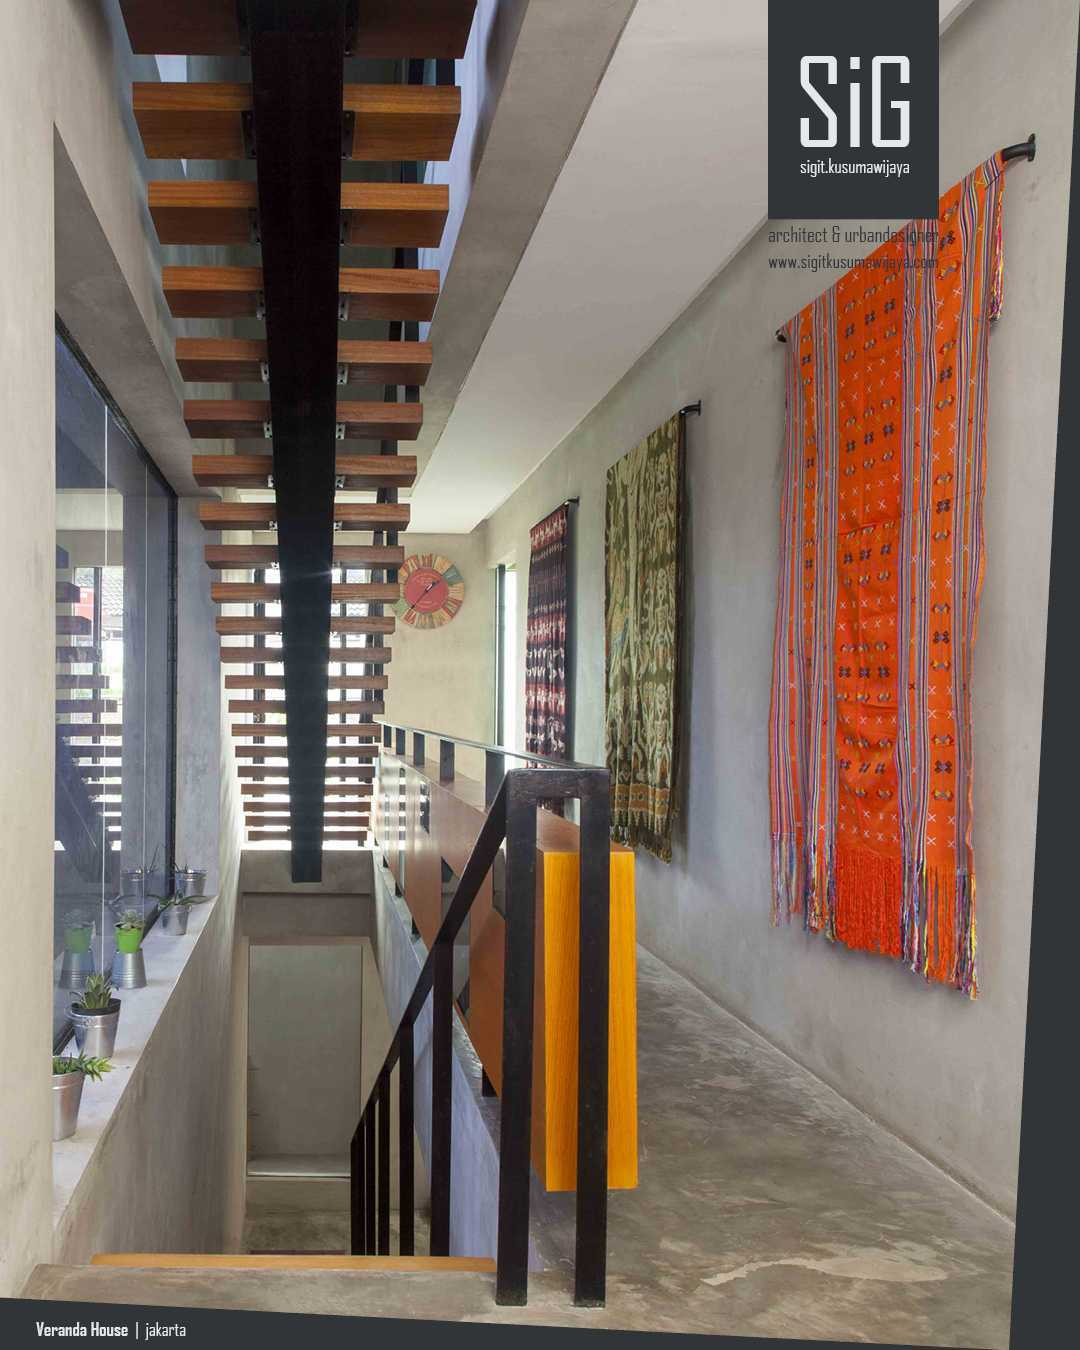 Sigit.kusumawijaya | Architect & Urbandesigner Rumah Beranda - Green Boarding House Cipete, South Jakarta, Indonesia Cipete, South Jakarta, Indonesia Sigitkusumawijaya-Architect-Urbandesigner-Rumah-Beranda-Green-Boarding-House Industrial  55005